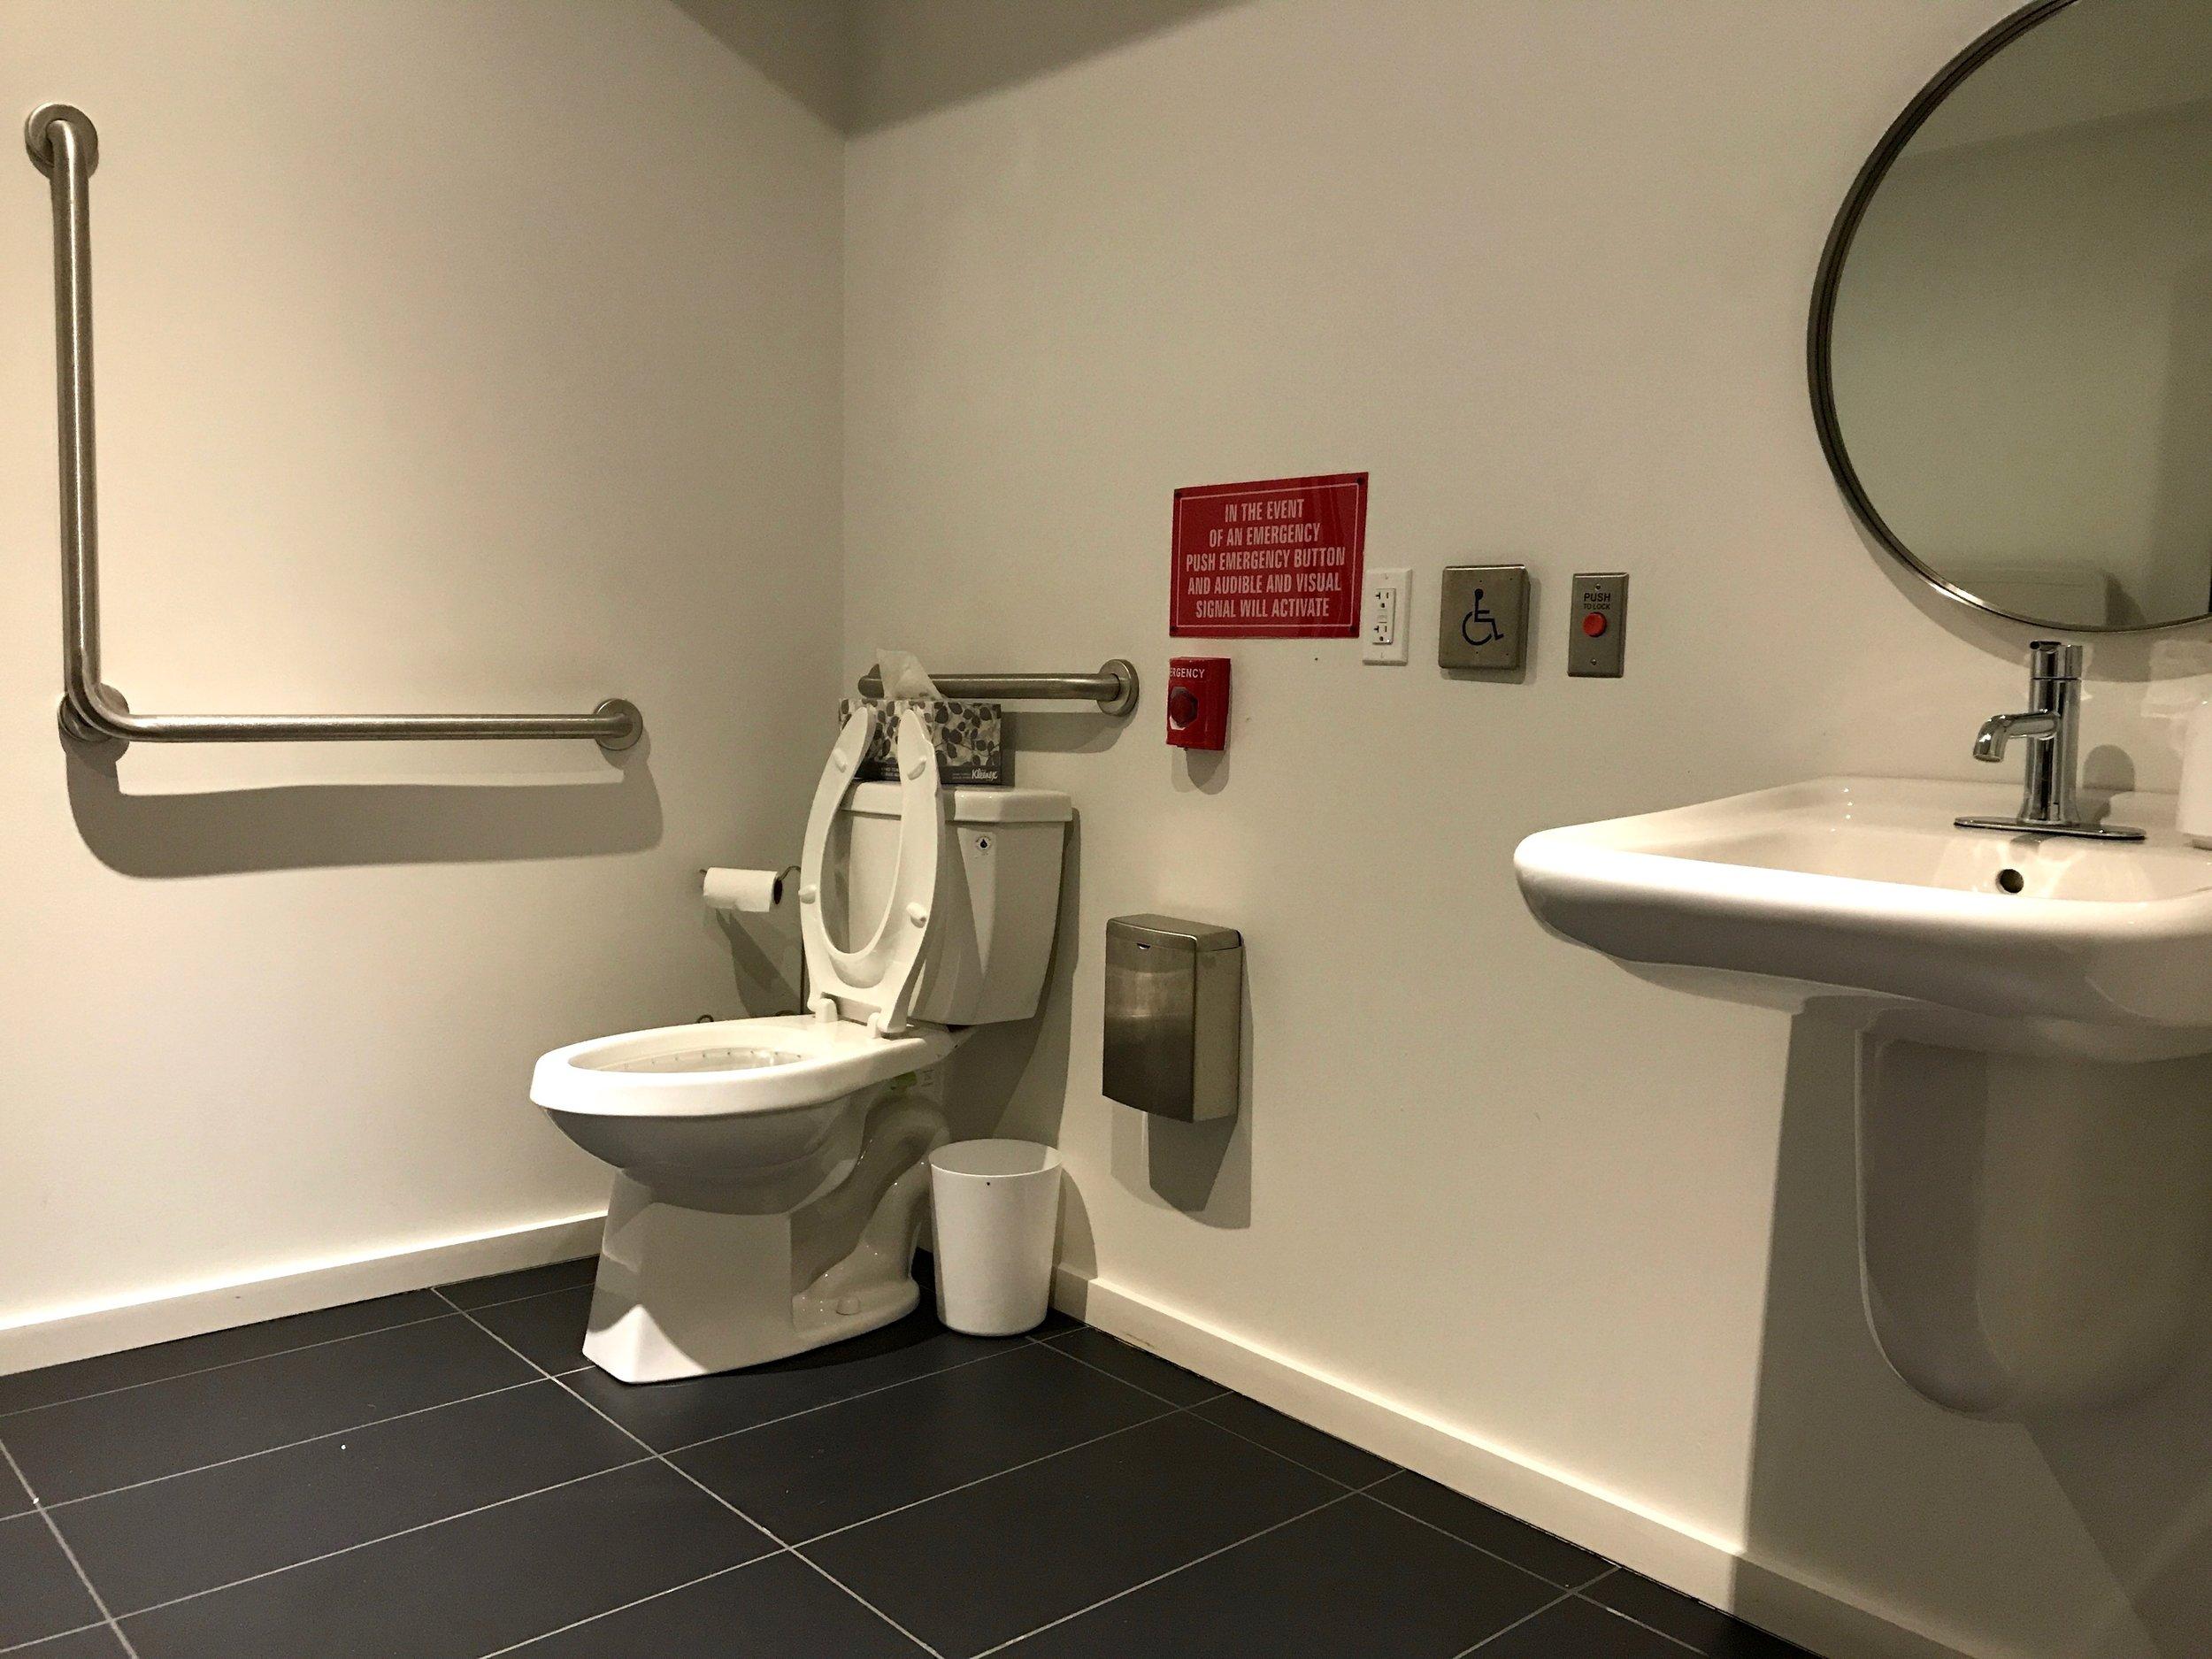 oretta restroom, sink and toilet